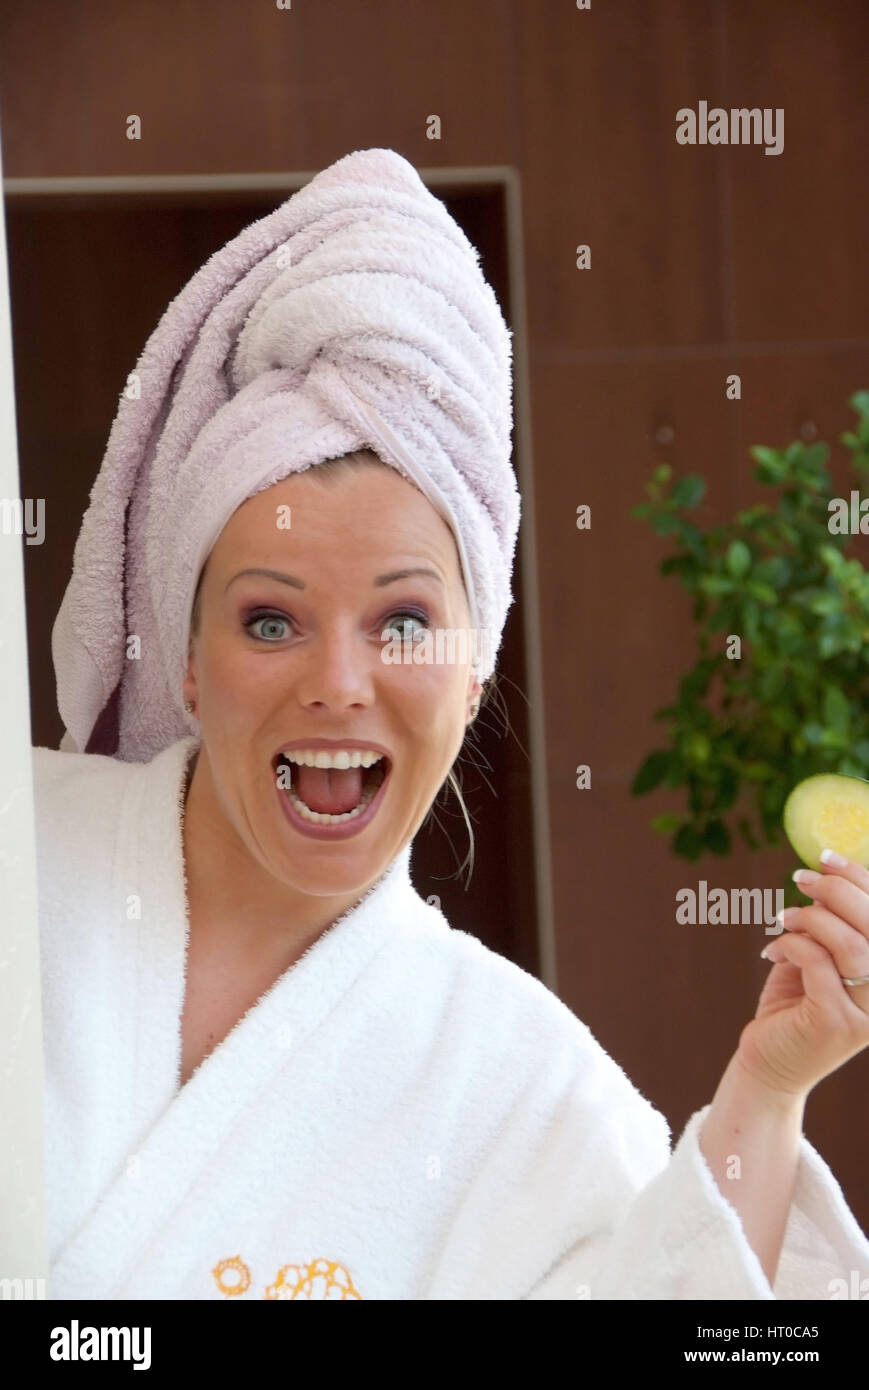 Junge, vitale Frau im Bademantel - young, vital woman in bathrobe - Stock Image